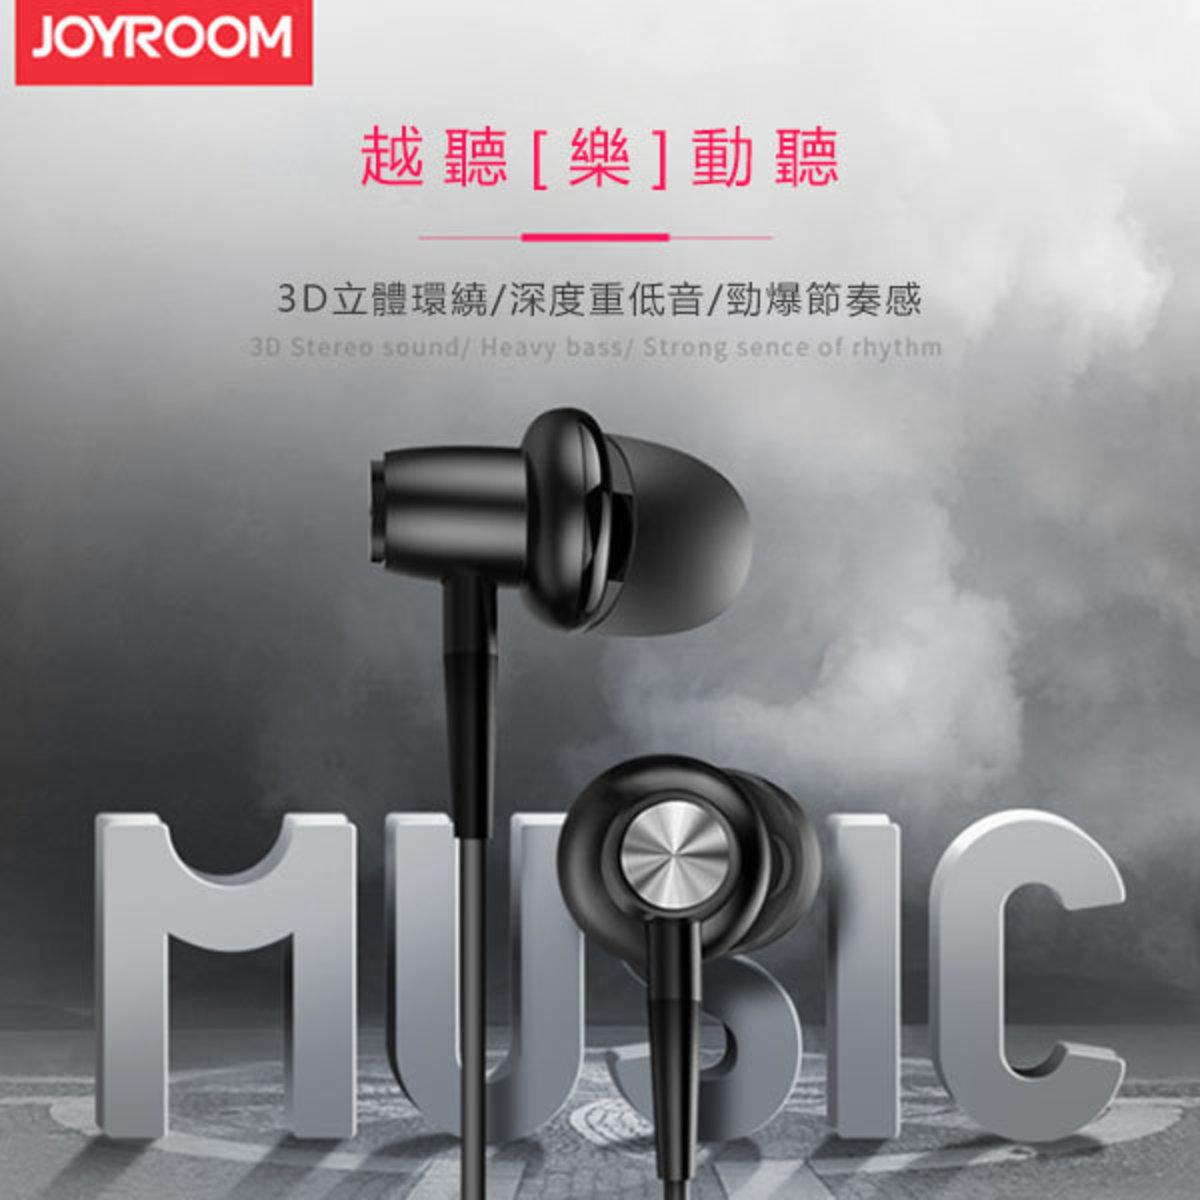 JOYROOM JR-E203 Beep Headphones